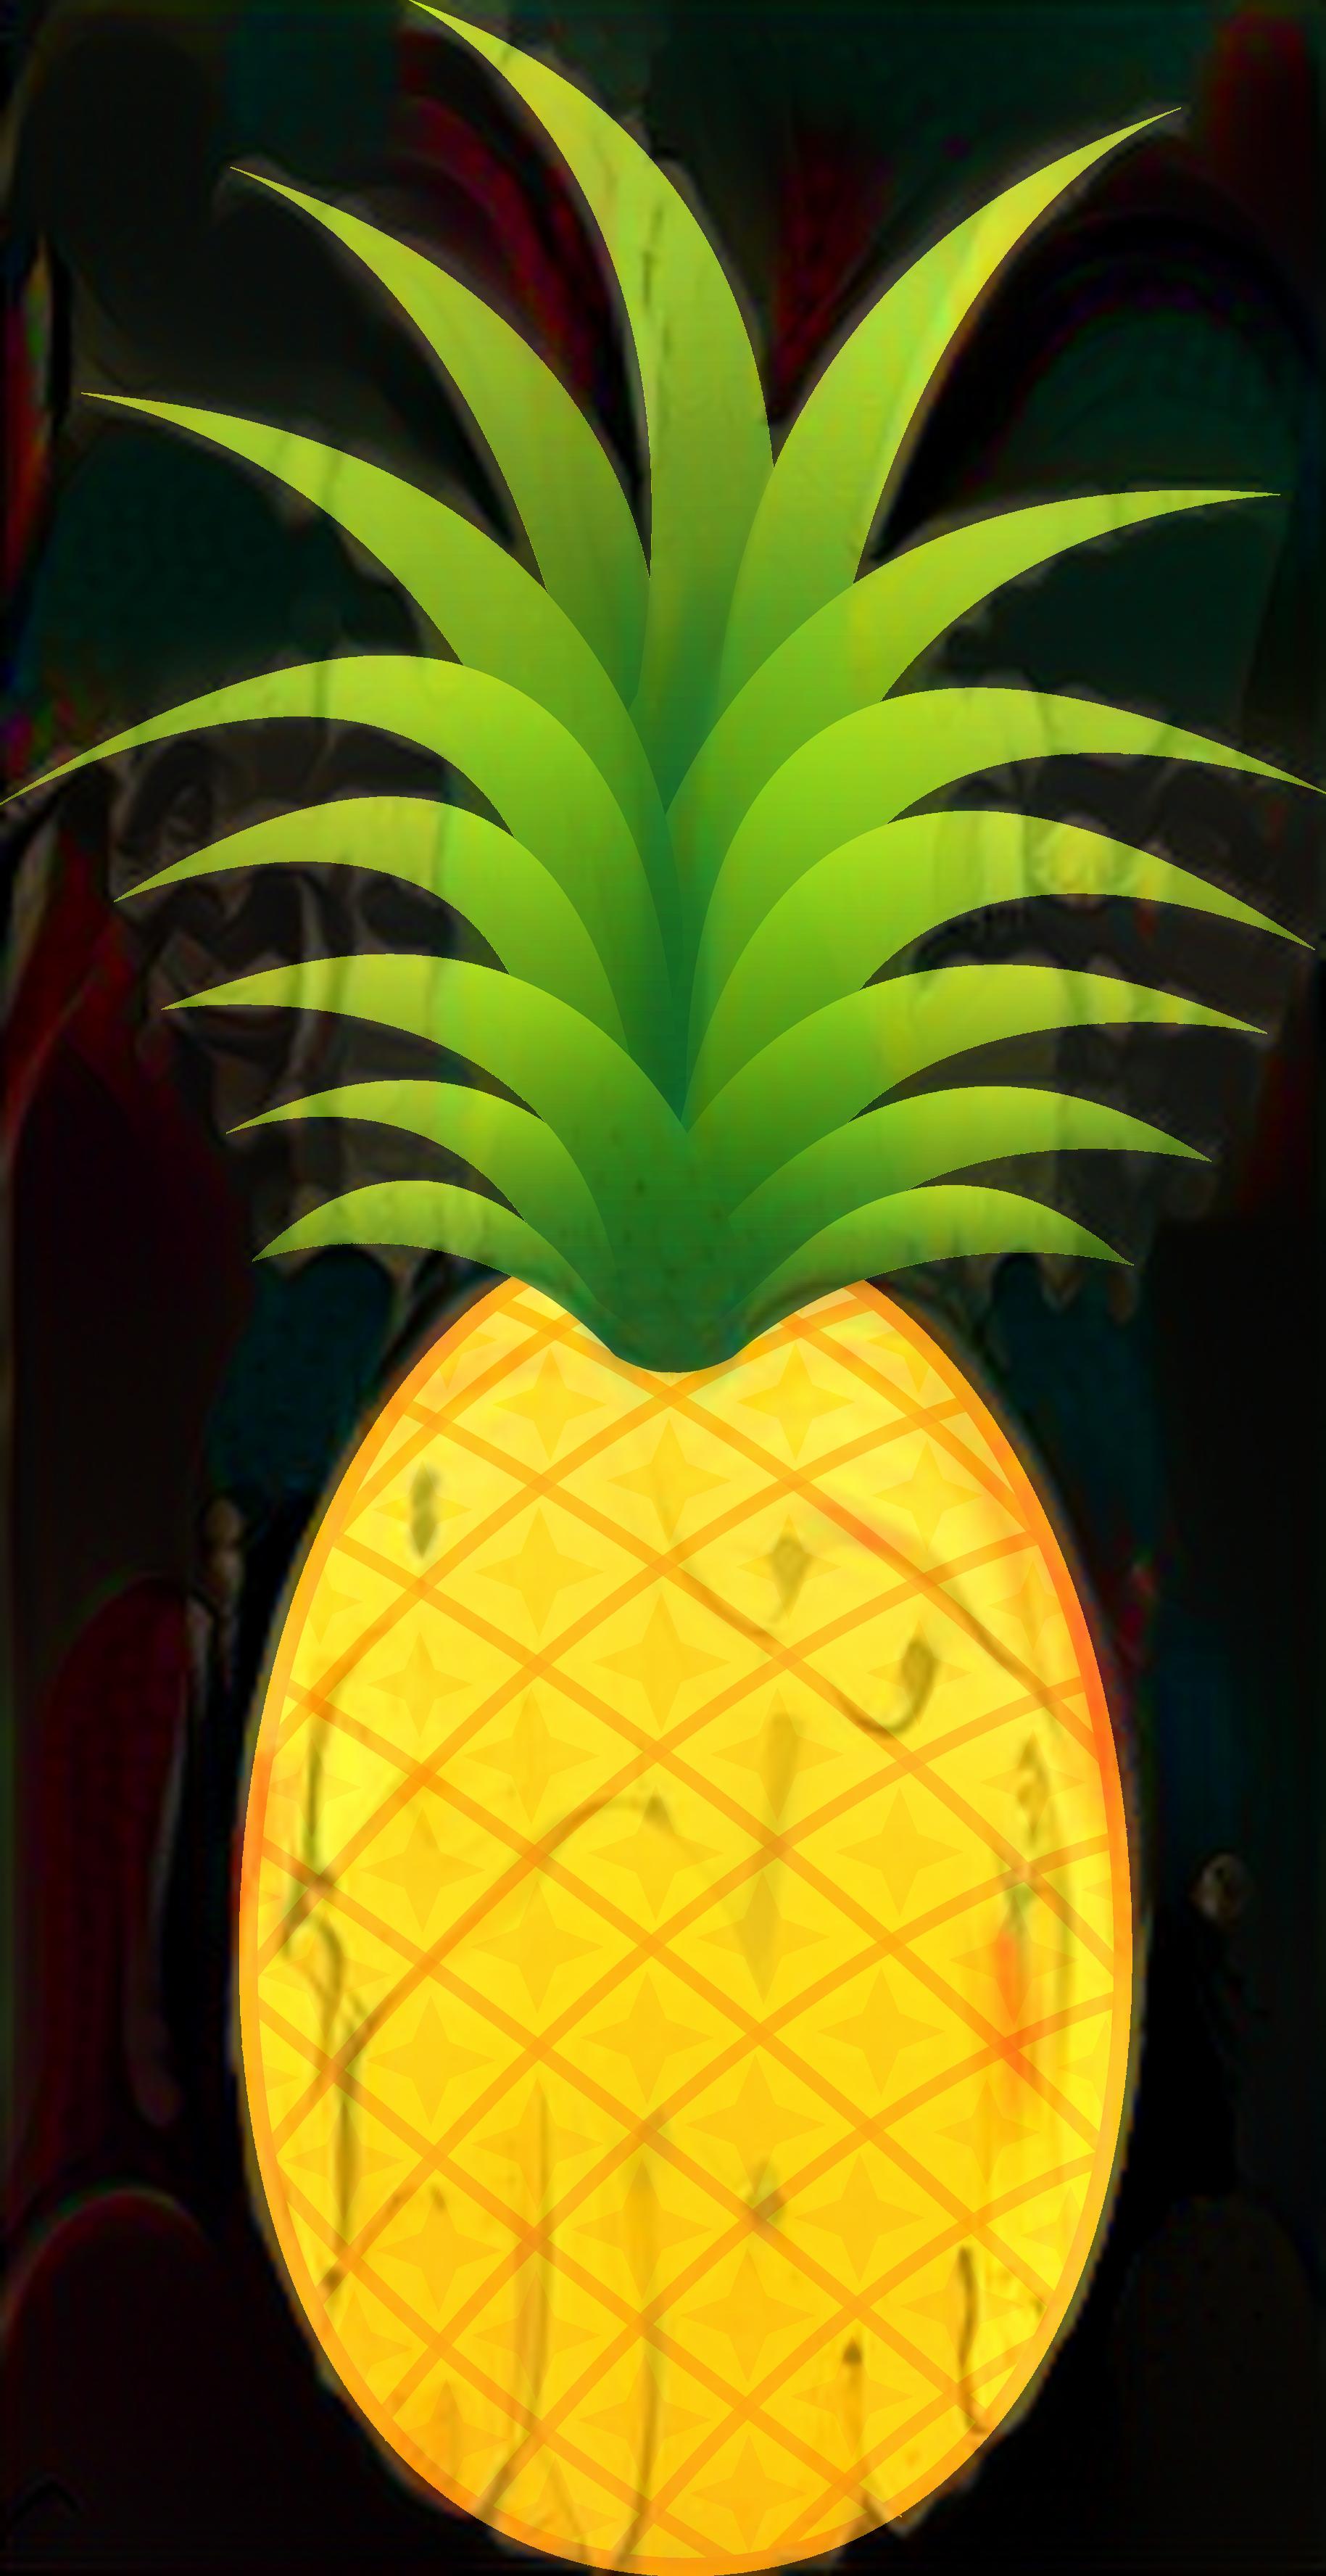 Pineapple clipart no background clip transparent Pineapple Clip art Portable Network Graphics Image ... clip transparent